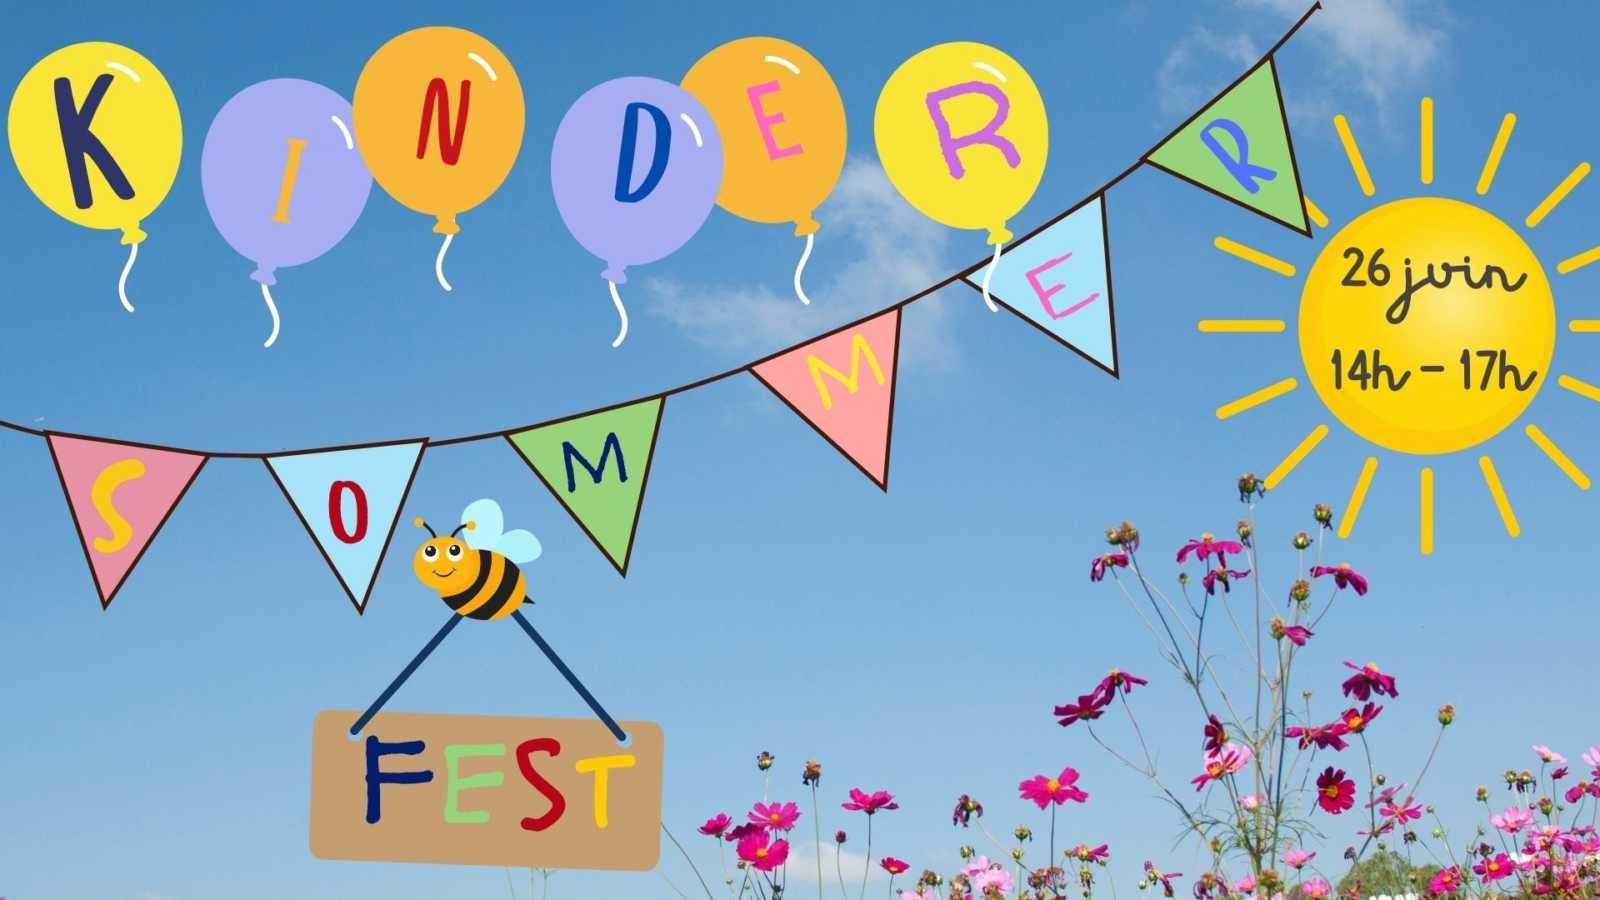 Samedi 26 juin 2021 de 14h à 17h : Kinder Sommerfest